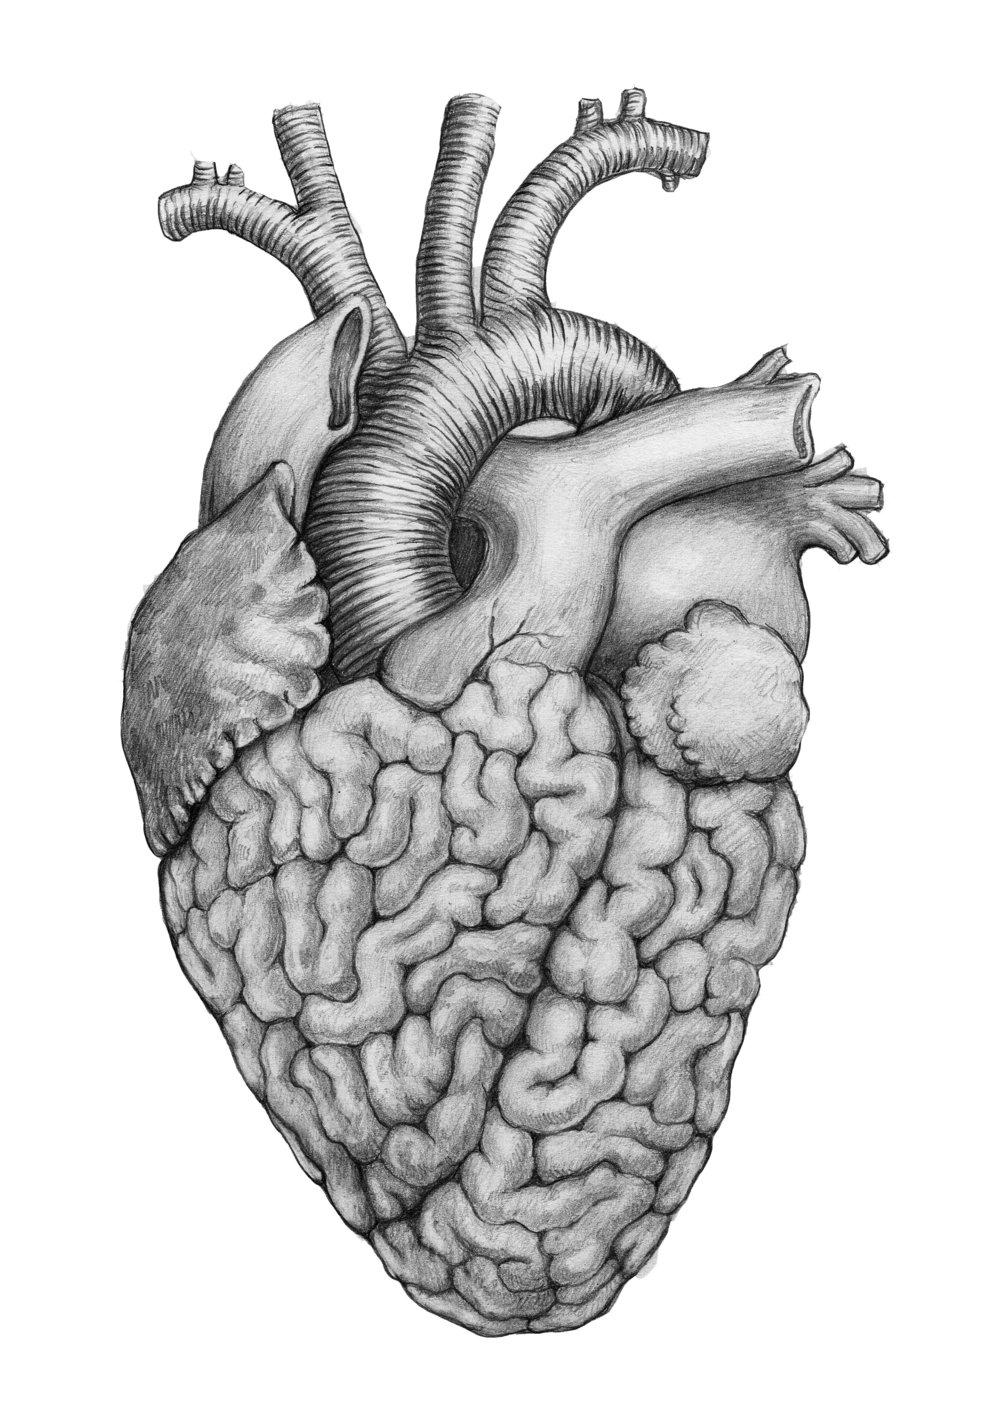 heart/brain - 11.2017